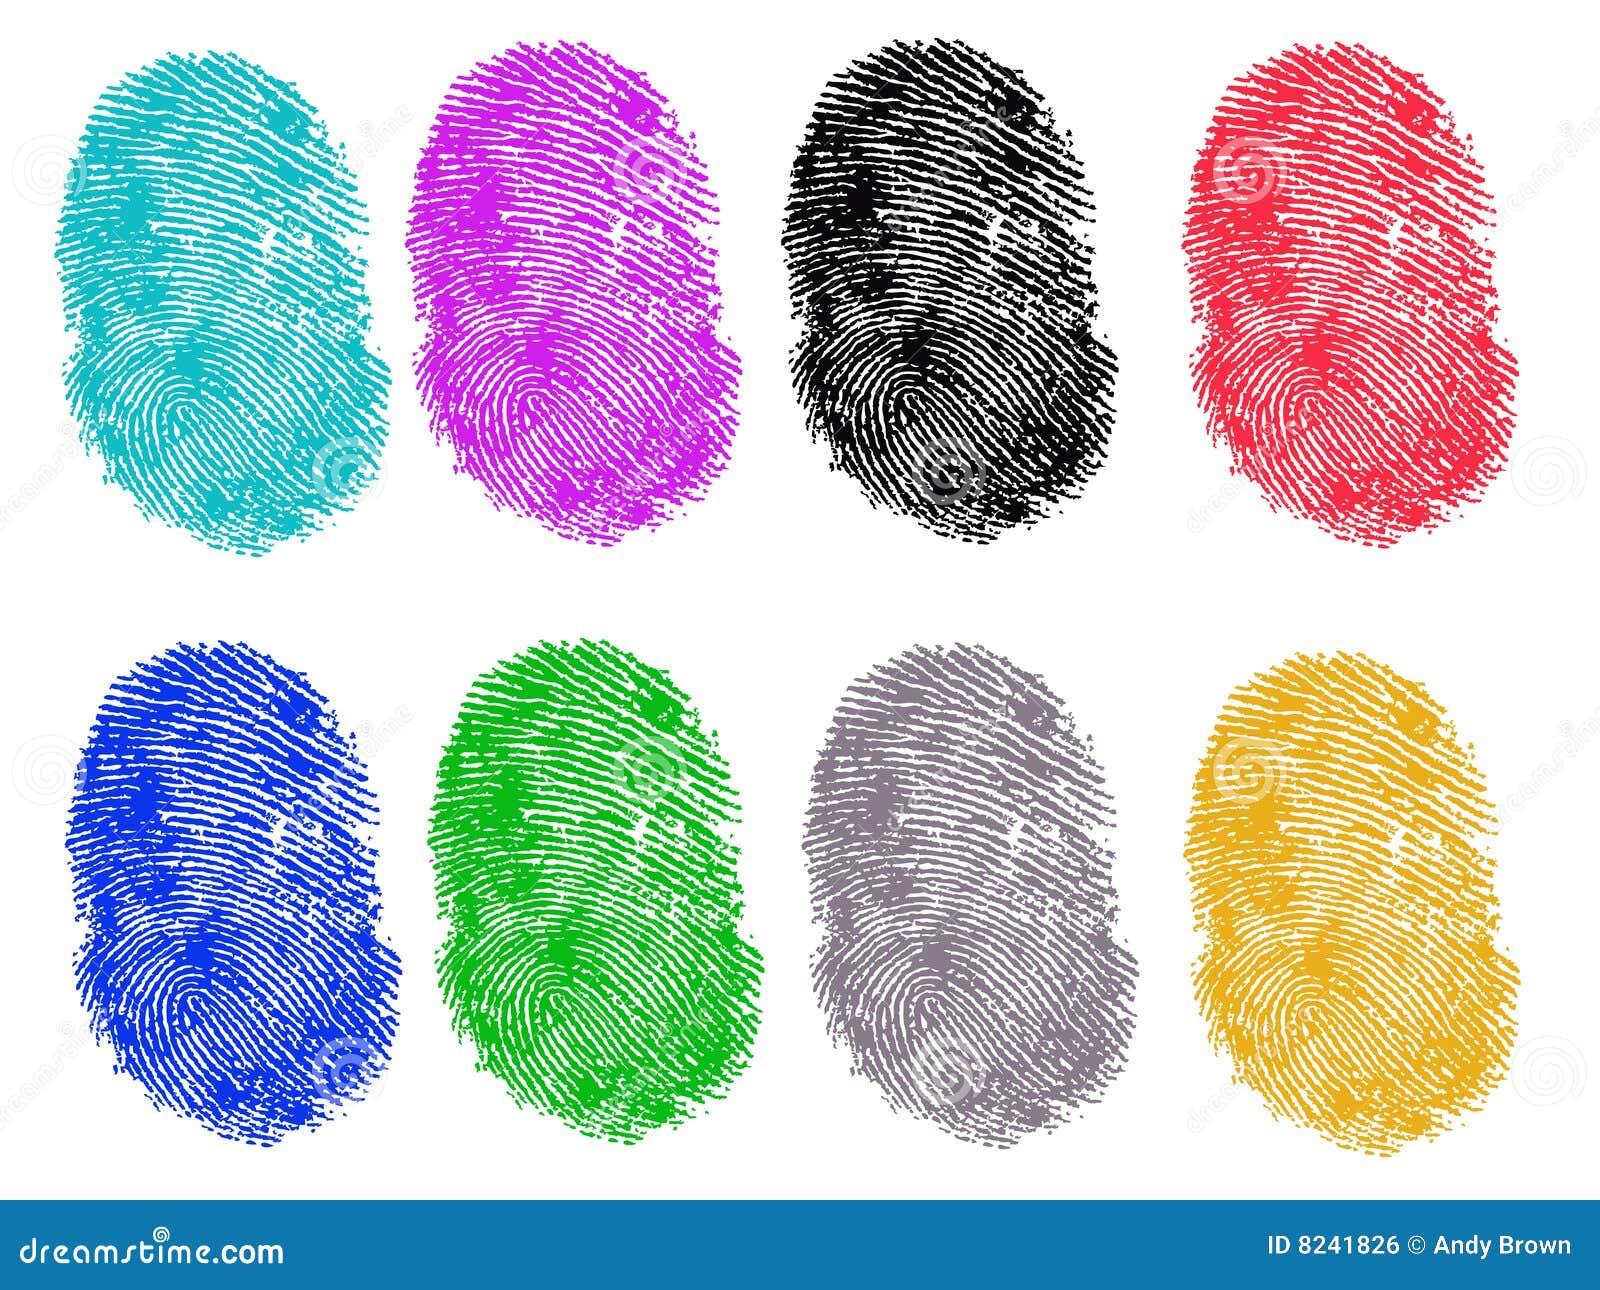 8 farbige Fingerabdrücke